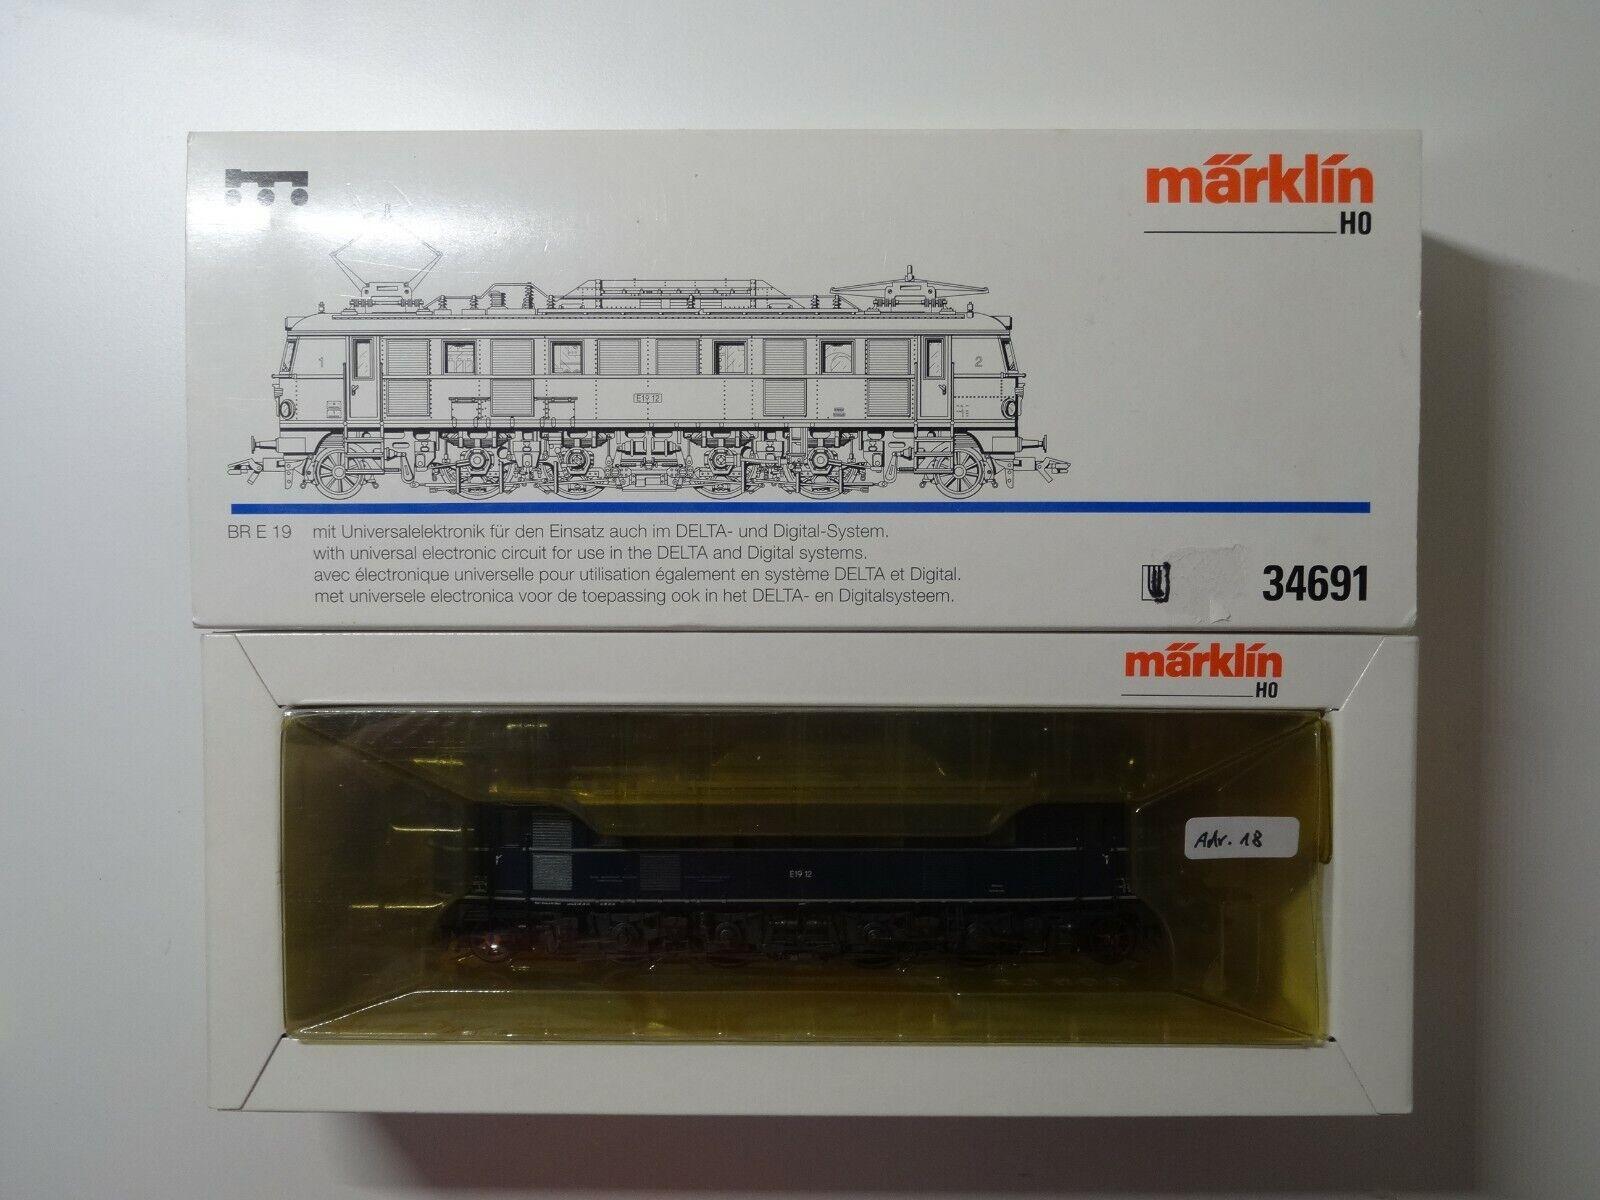 Märklin HO ART 34691 E-Lok BR e 19 della DR, MHI, Delta con OVP